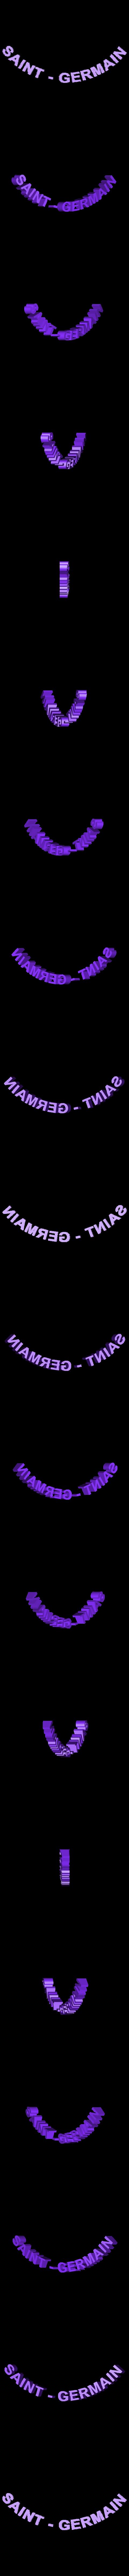 logo_psg_120_dome_st_Germain_blanc.STL Download free STL file PSG Logo Badge Dome Version • 3D printer model, lulu3Dbuilder